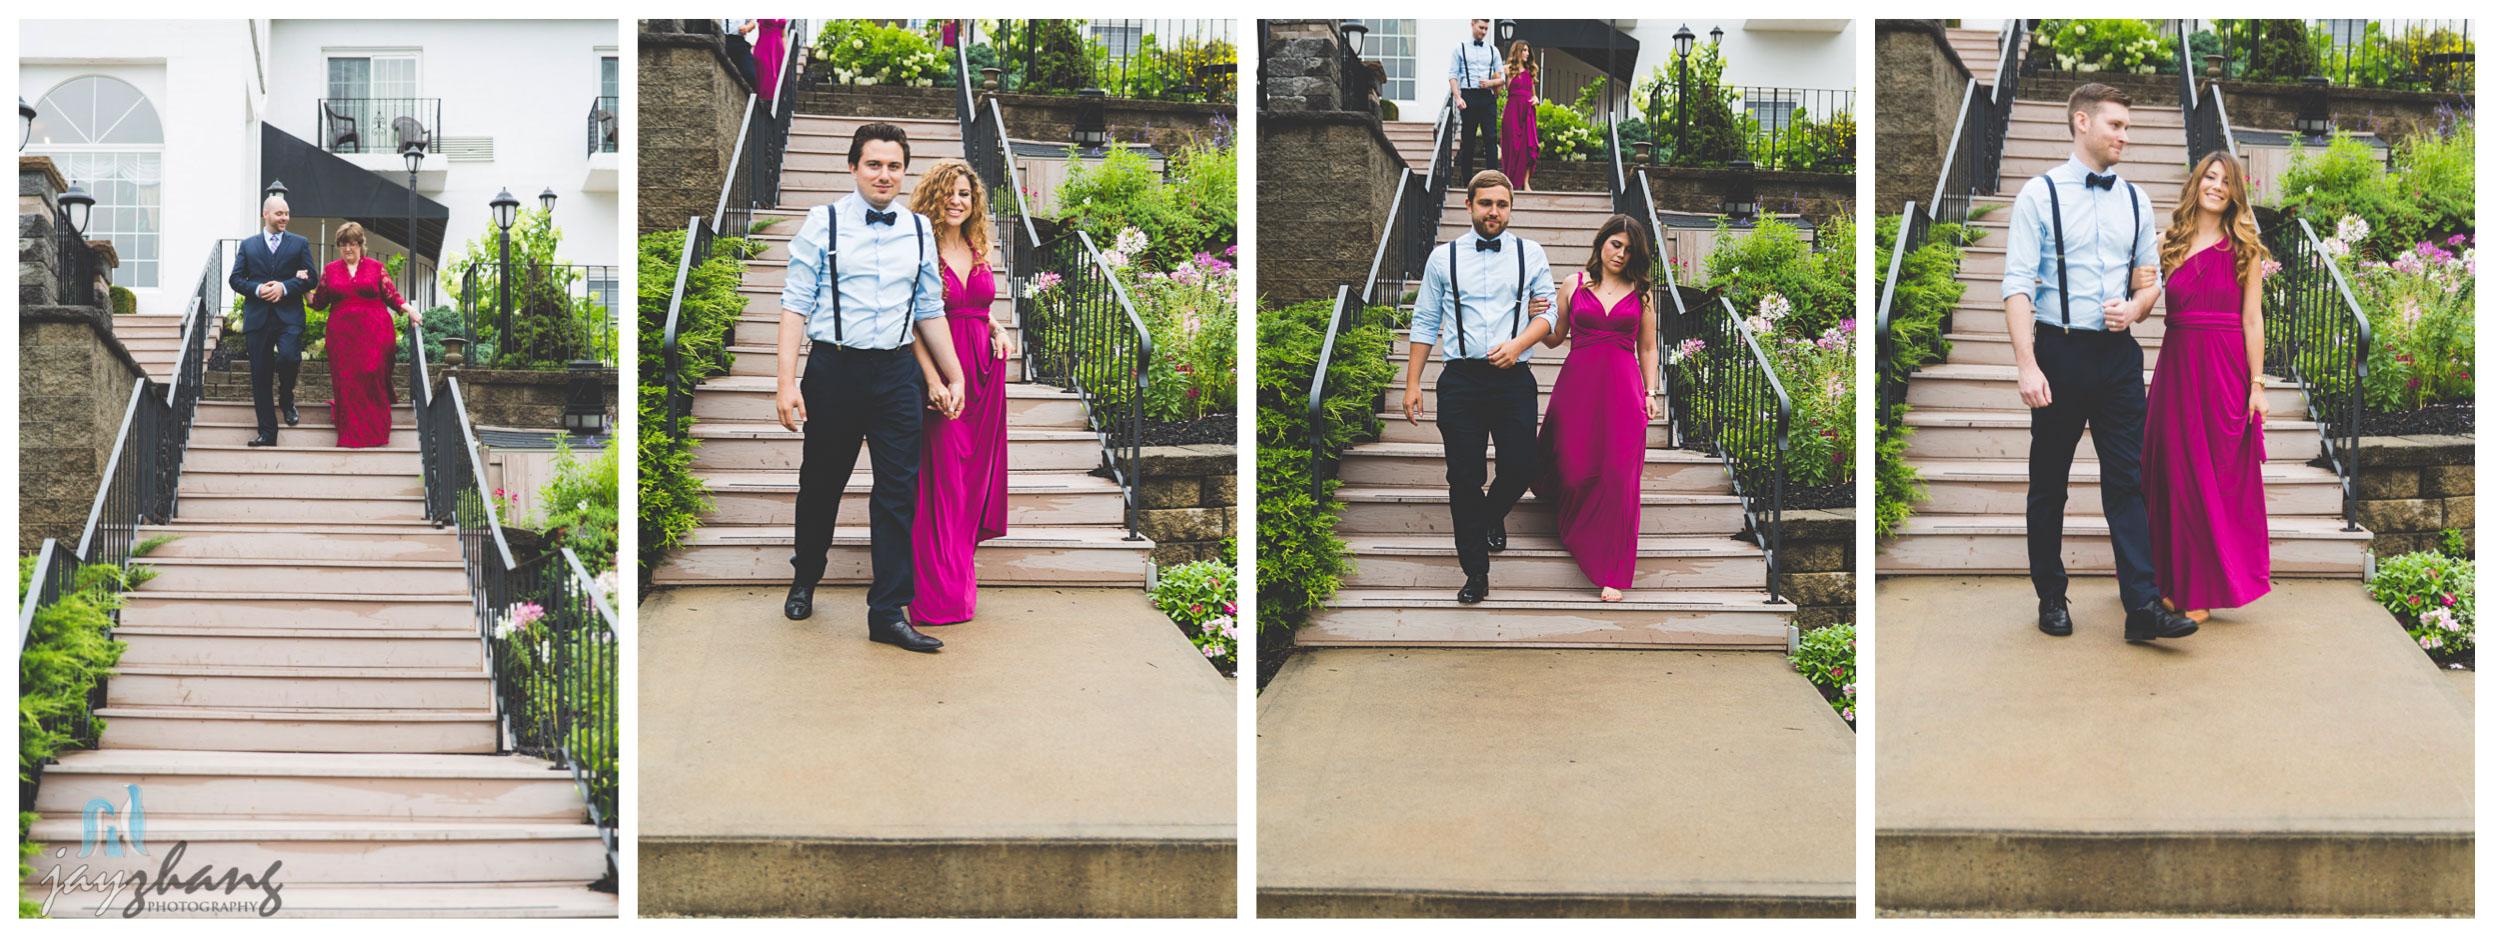 Albany_Wedding_Photographer-28.jpg